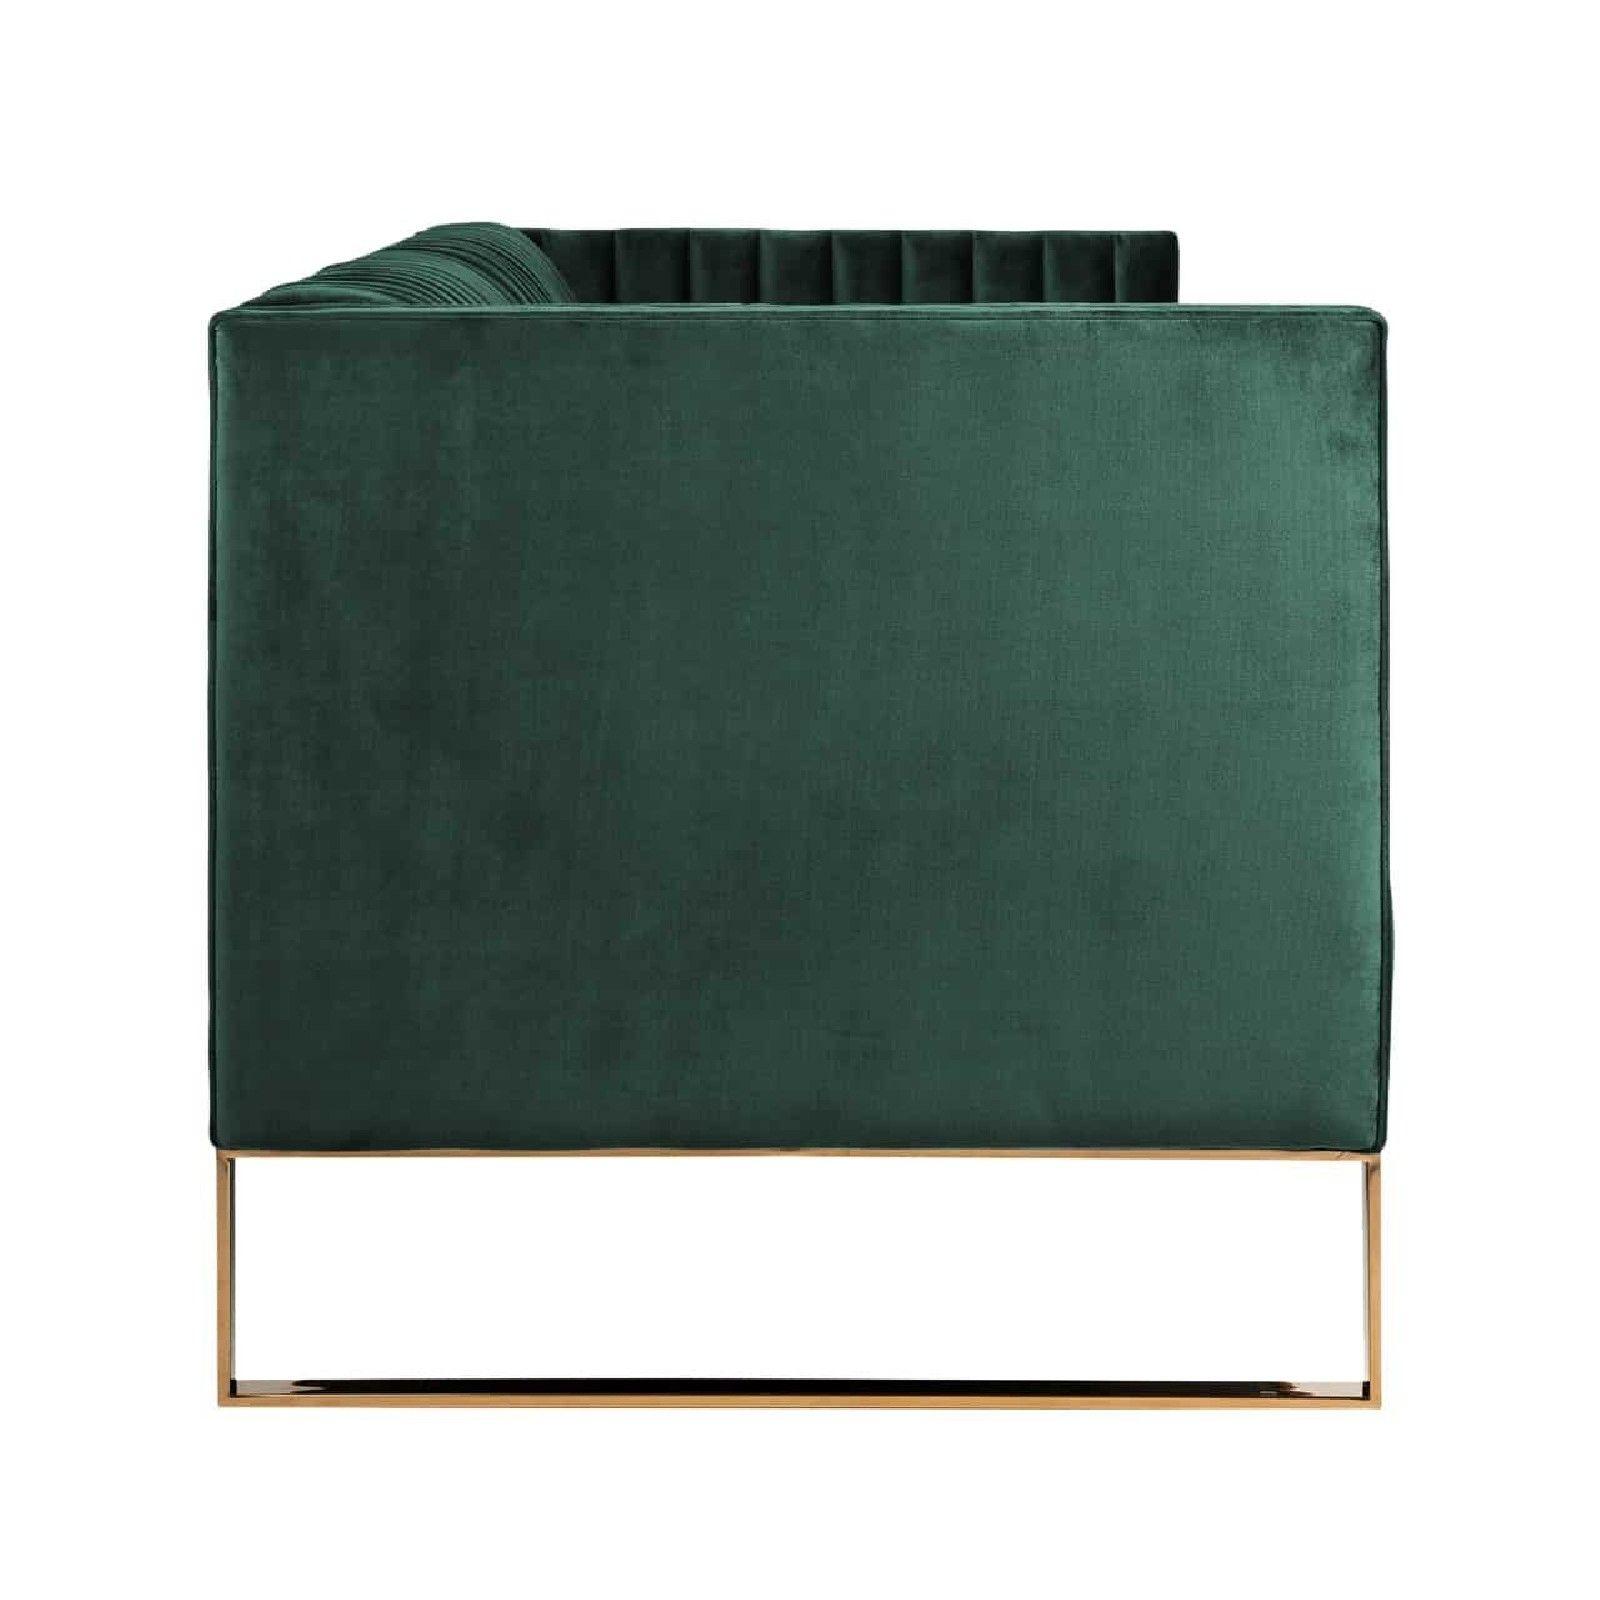 Canapé Contessa 3-places Green Velvet / gold Meuble Déco Tendance - 157